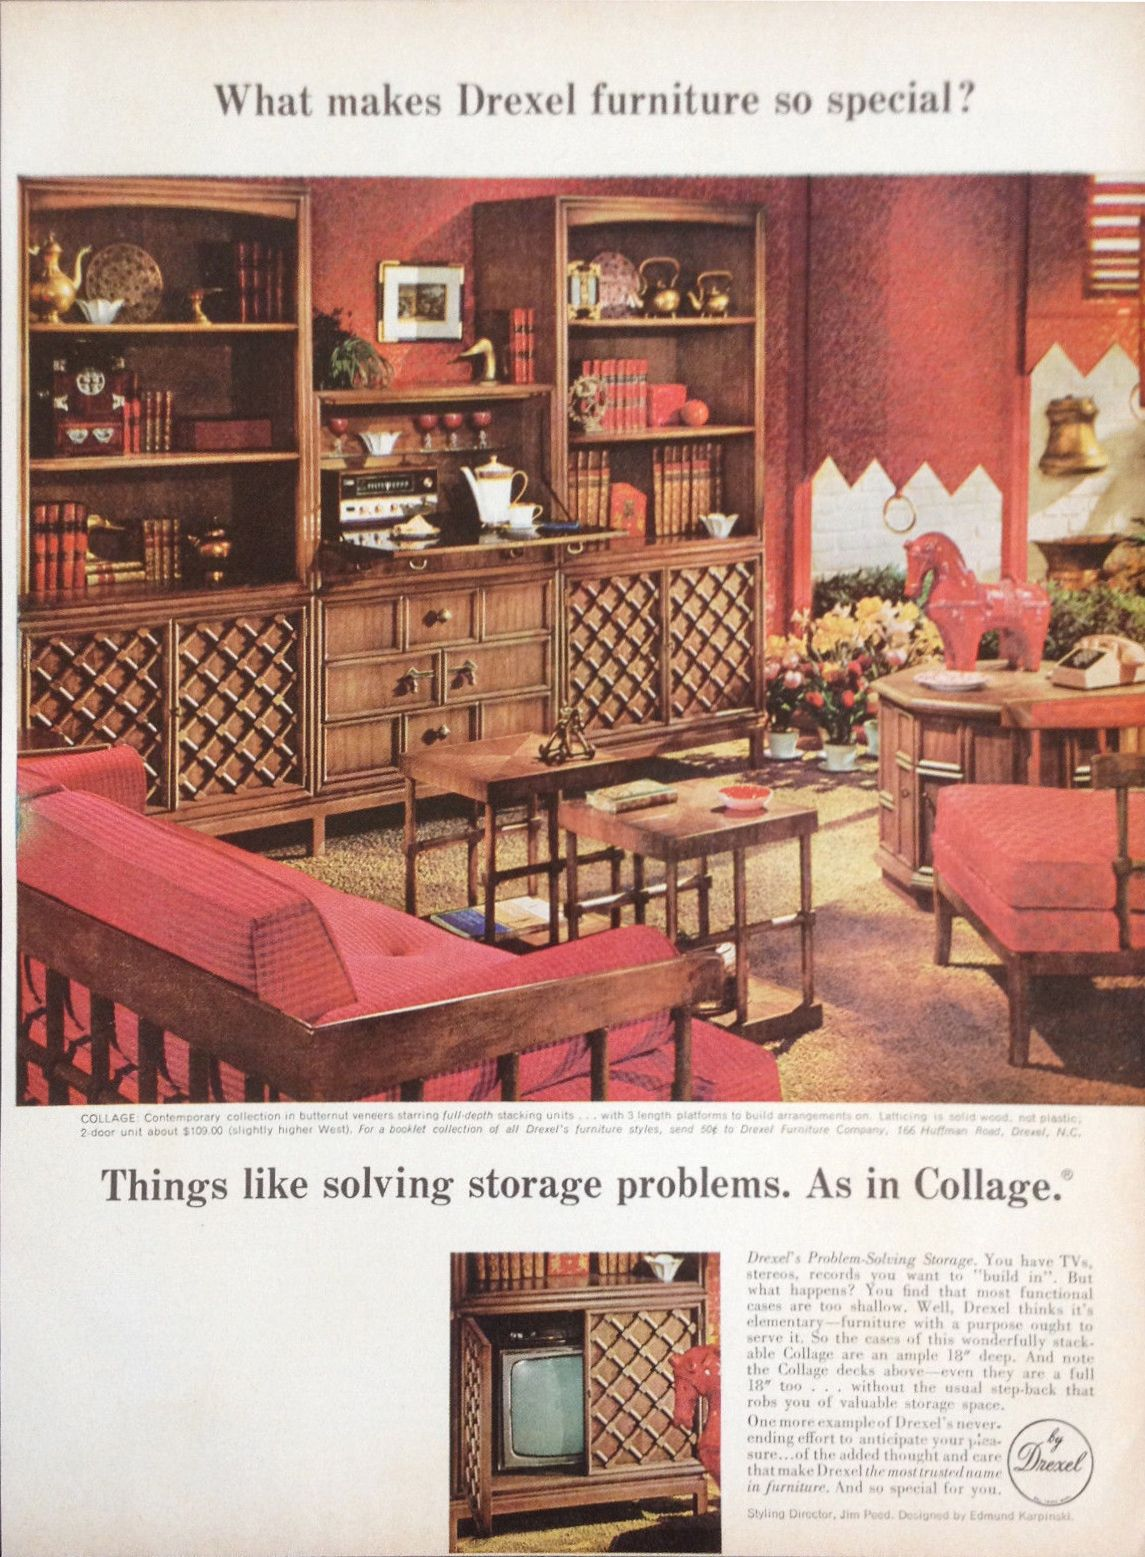 drexel dining room furniture 1960 | Drexel 1967 Collage in 2019 | Furniture, Retro room ...